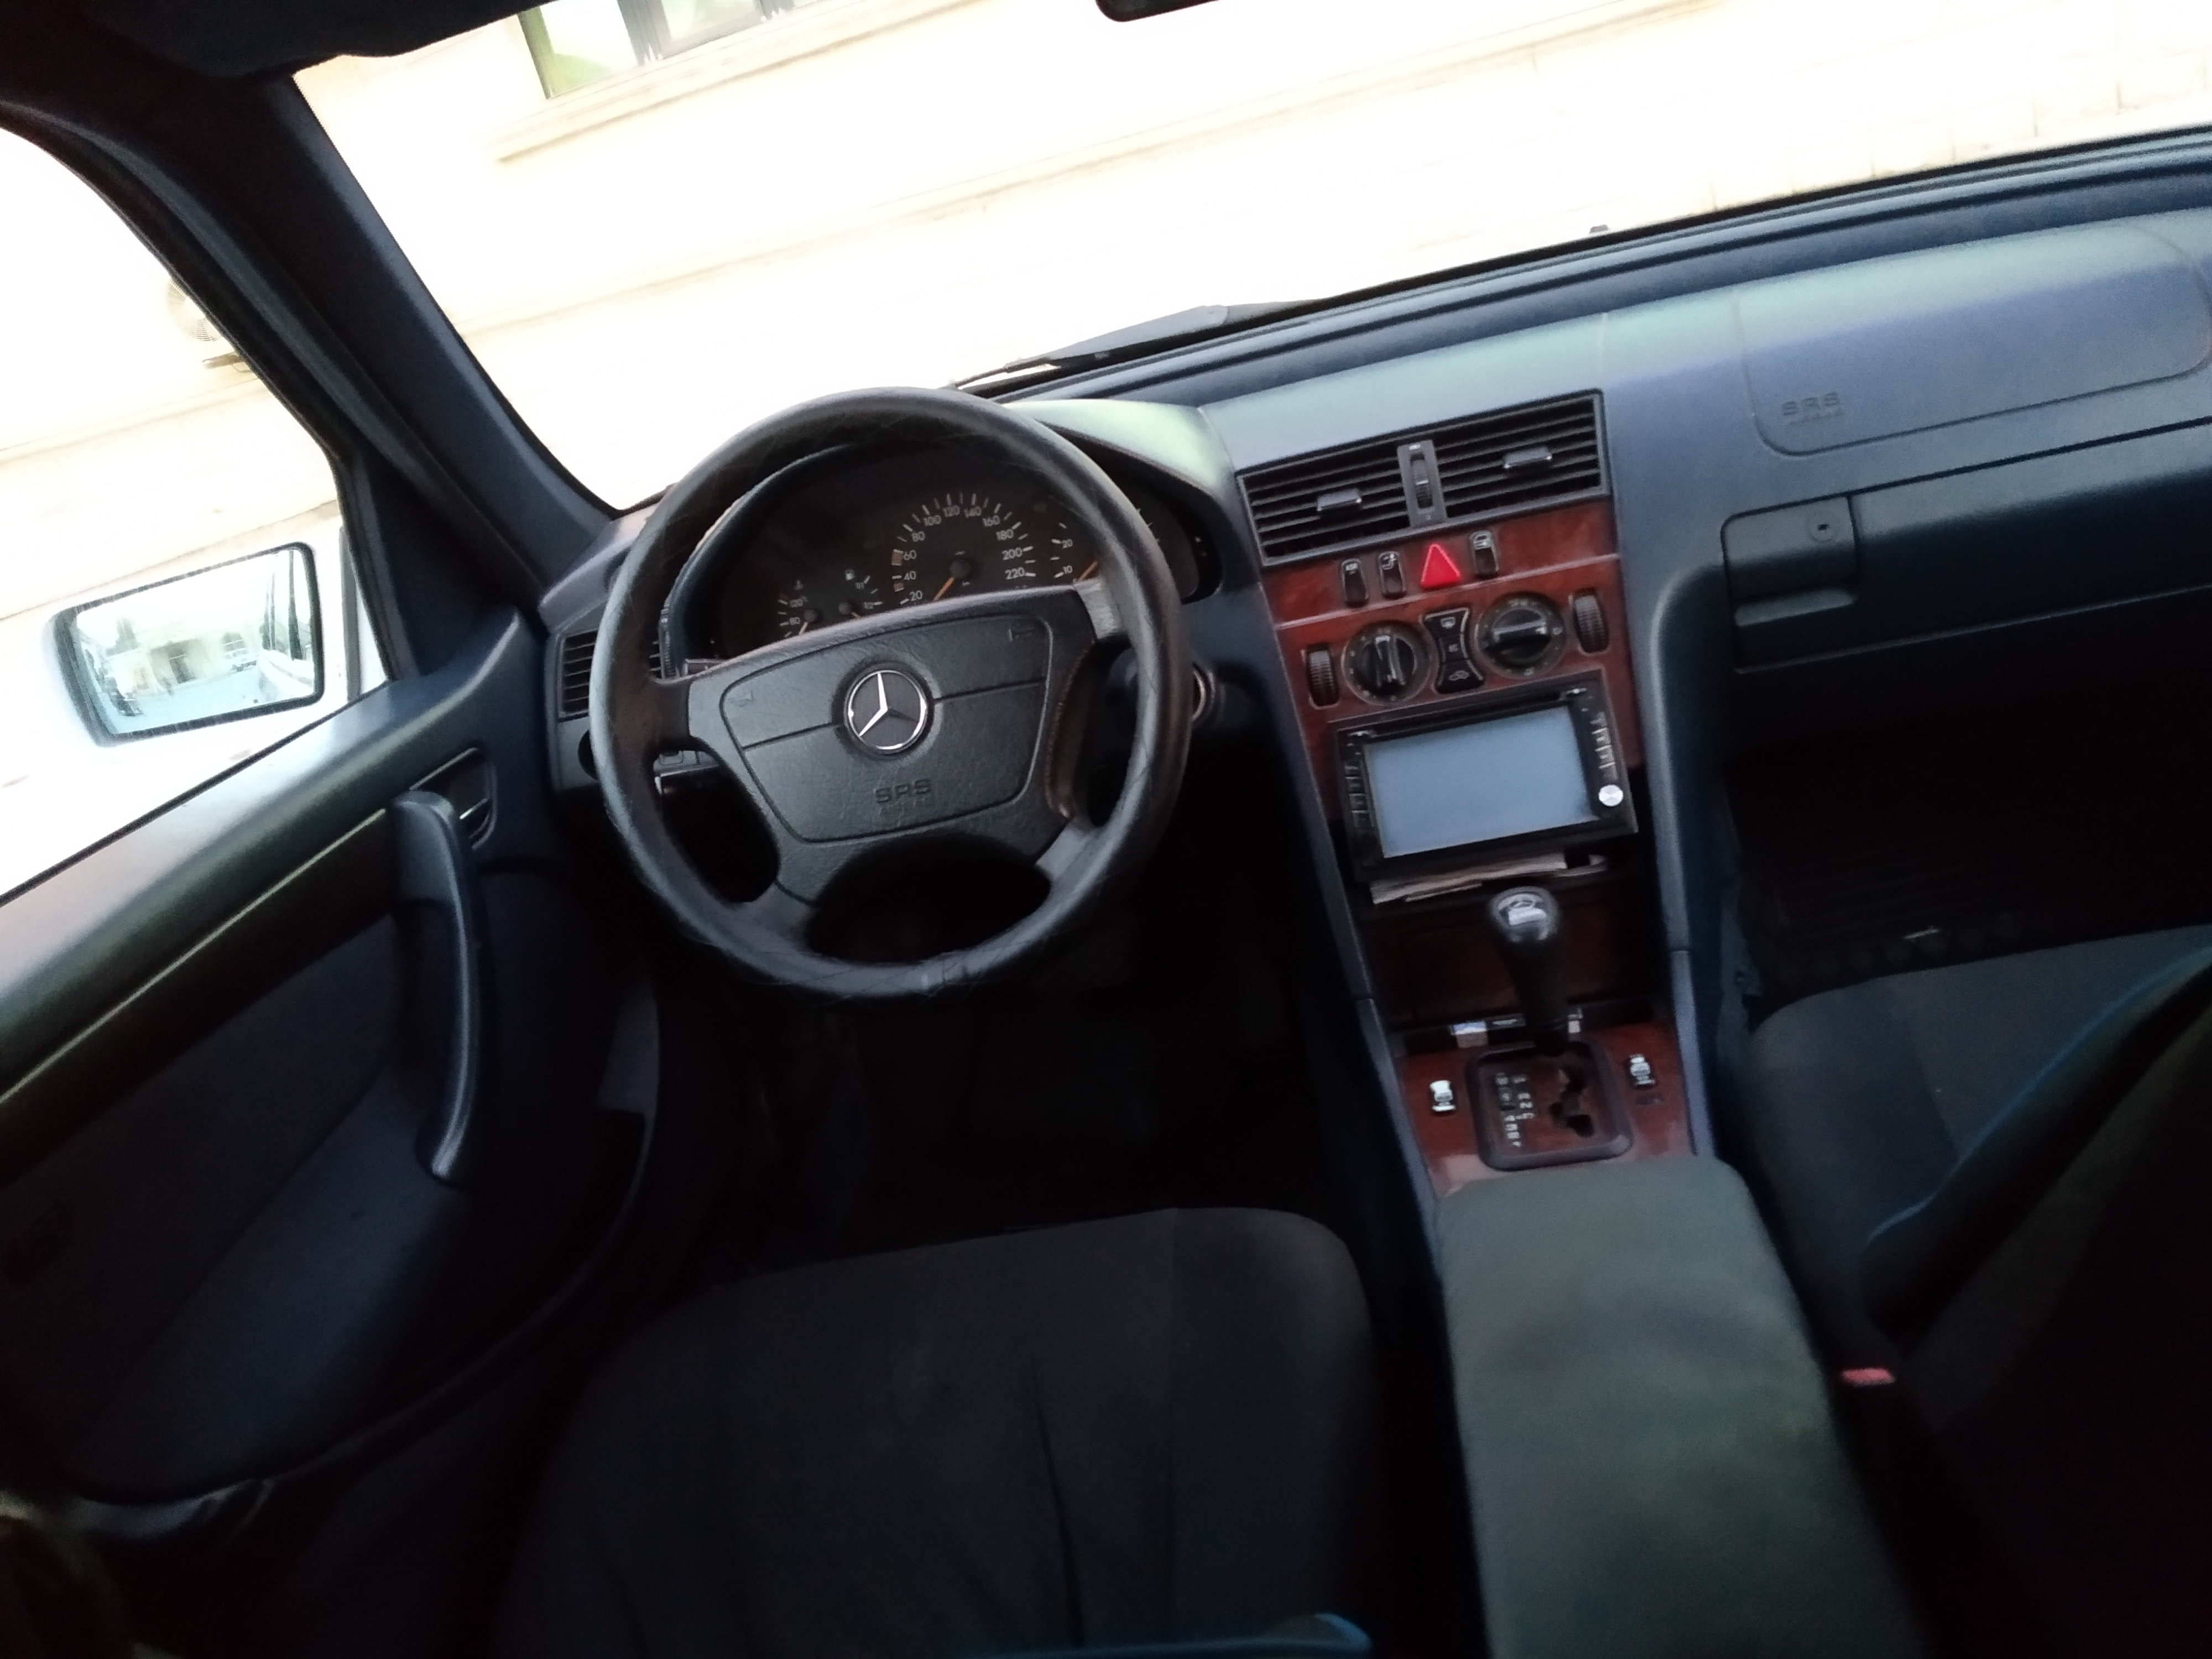 Mercedes-Benz C 180 1.8(lt) 1999 İkinci əl  $10600